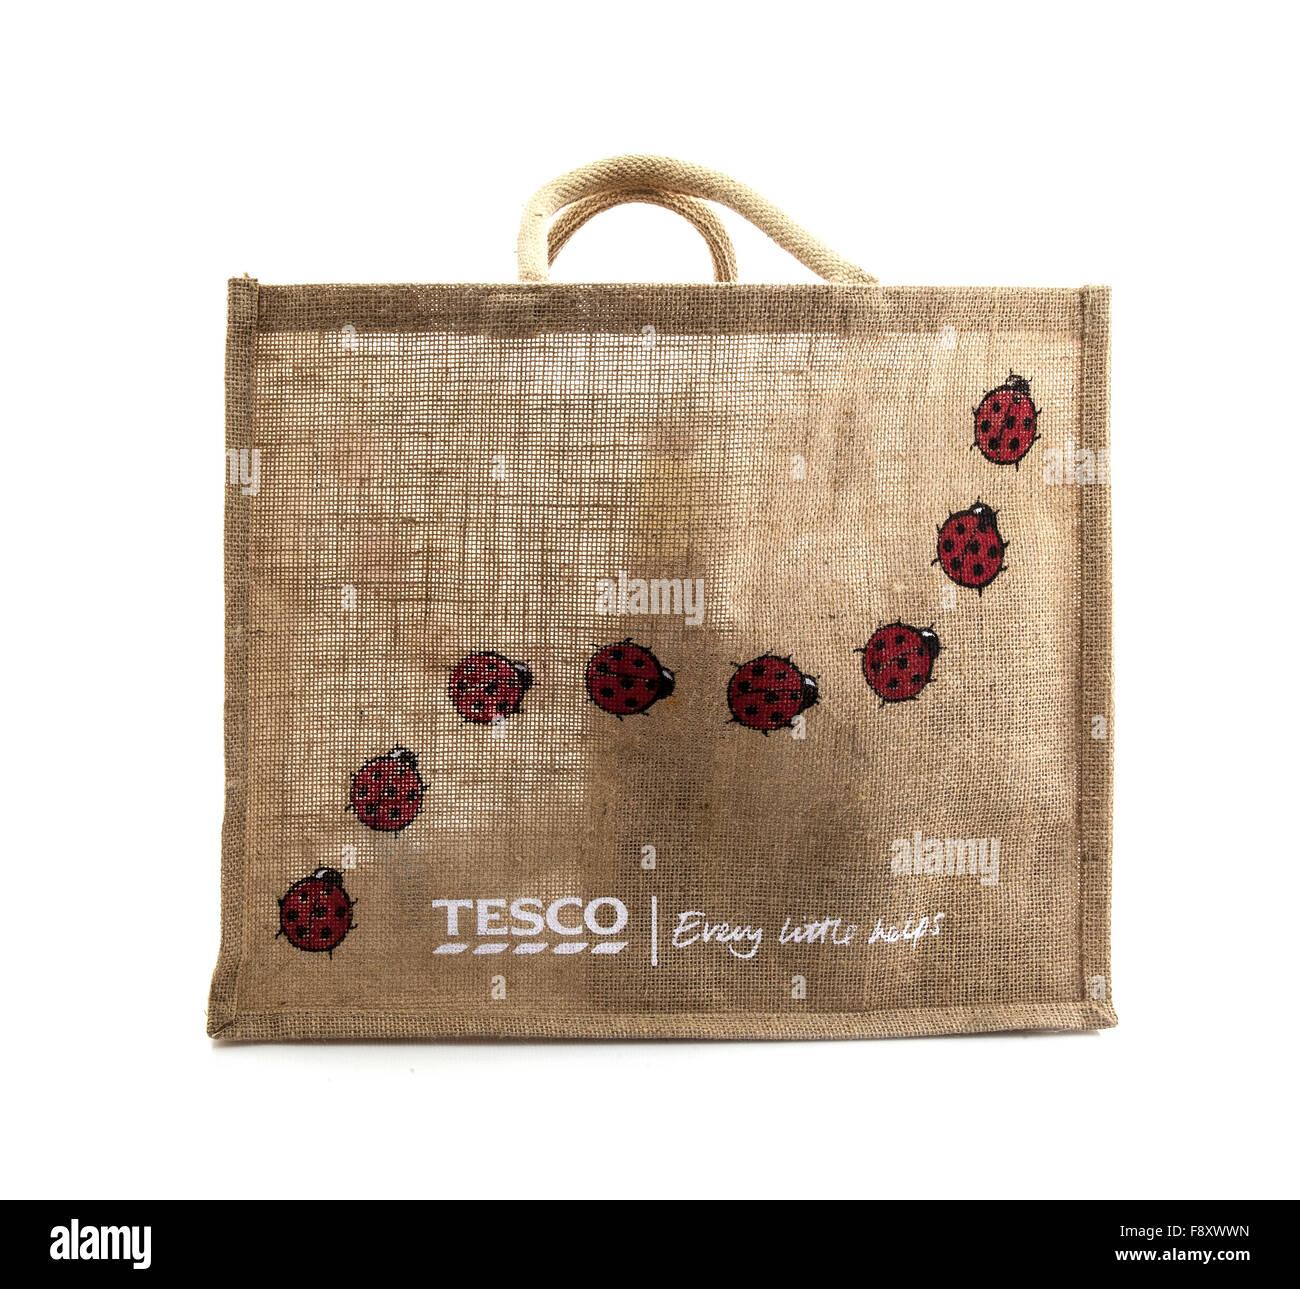 Tesco reusable Bag for Life on a white background - Stock Image